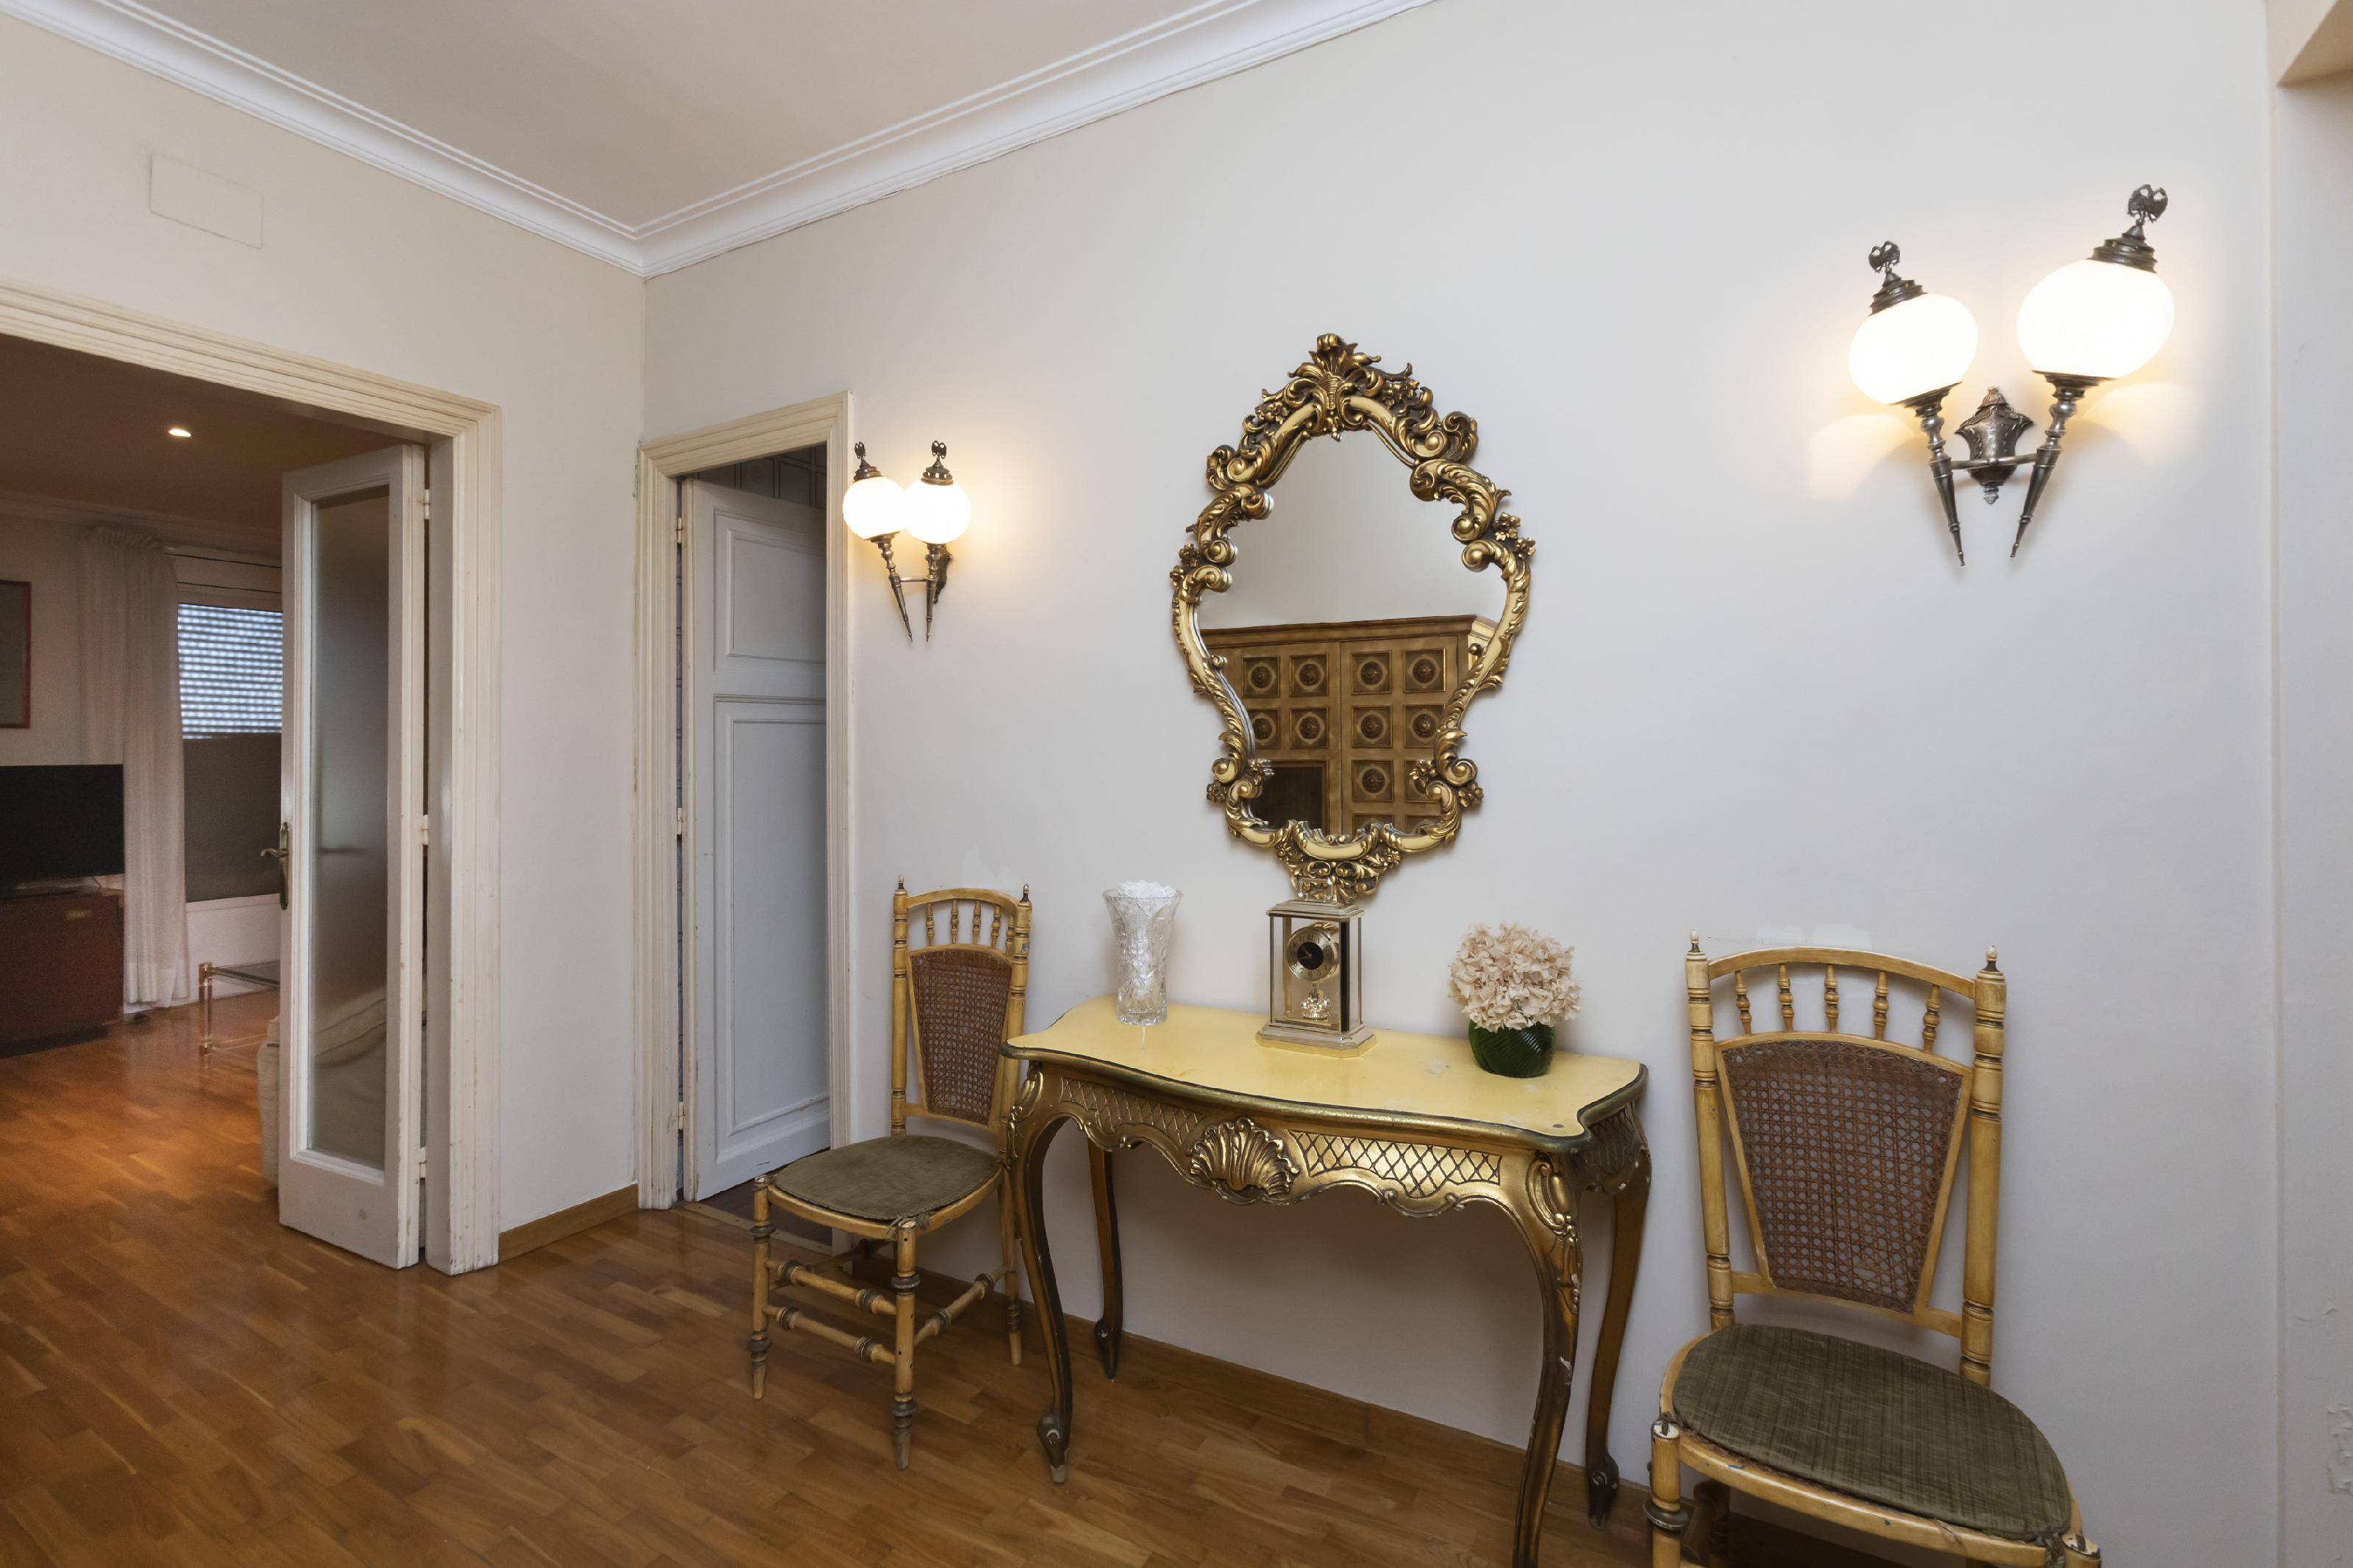 247097 Flat for sale in Sarrià-Sant Gervasi, Sant Gervasi-Galvany 9